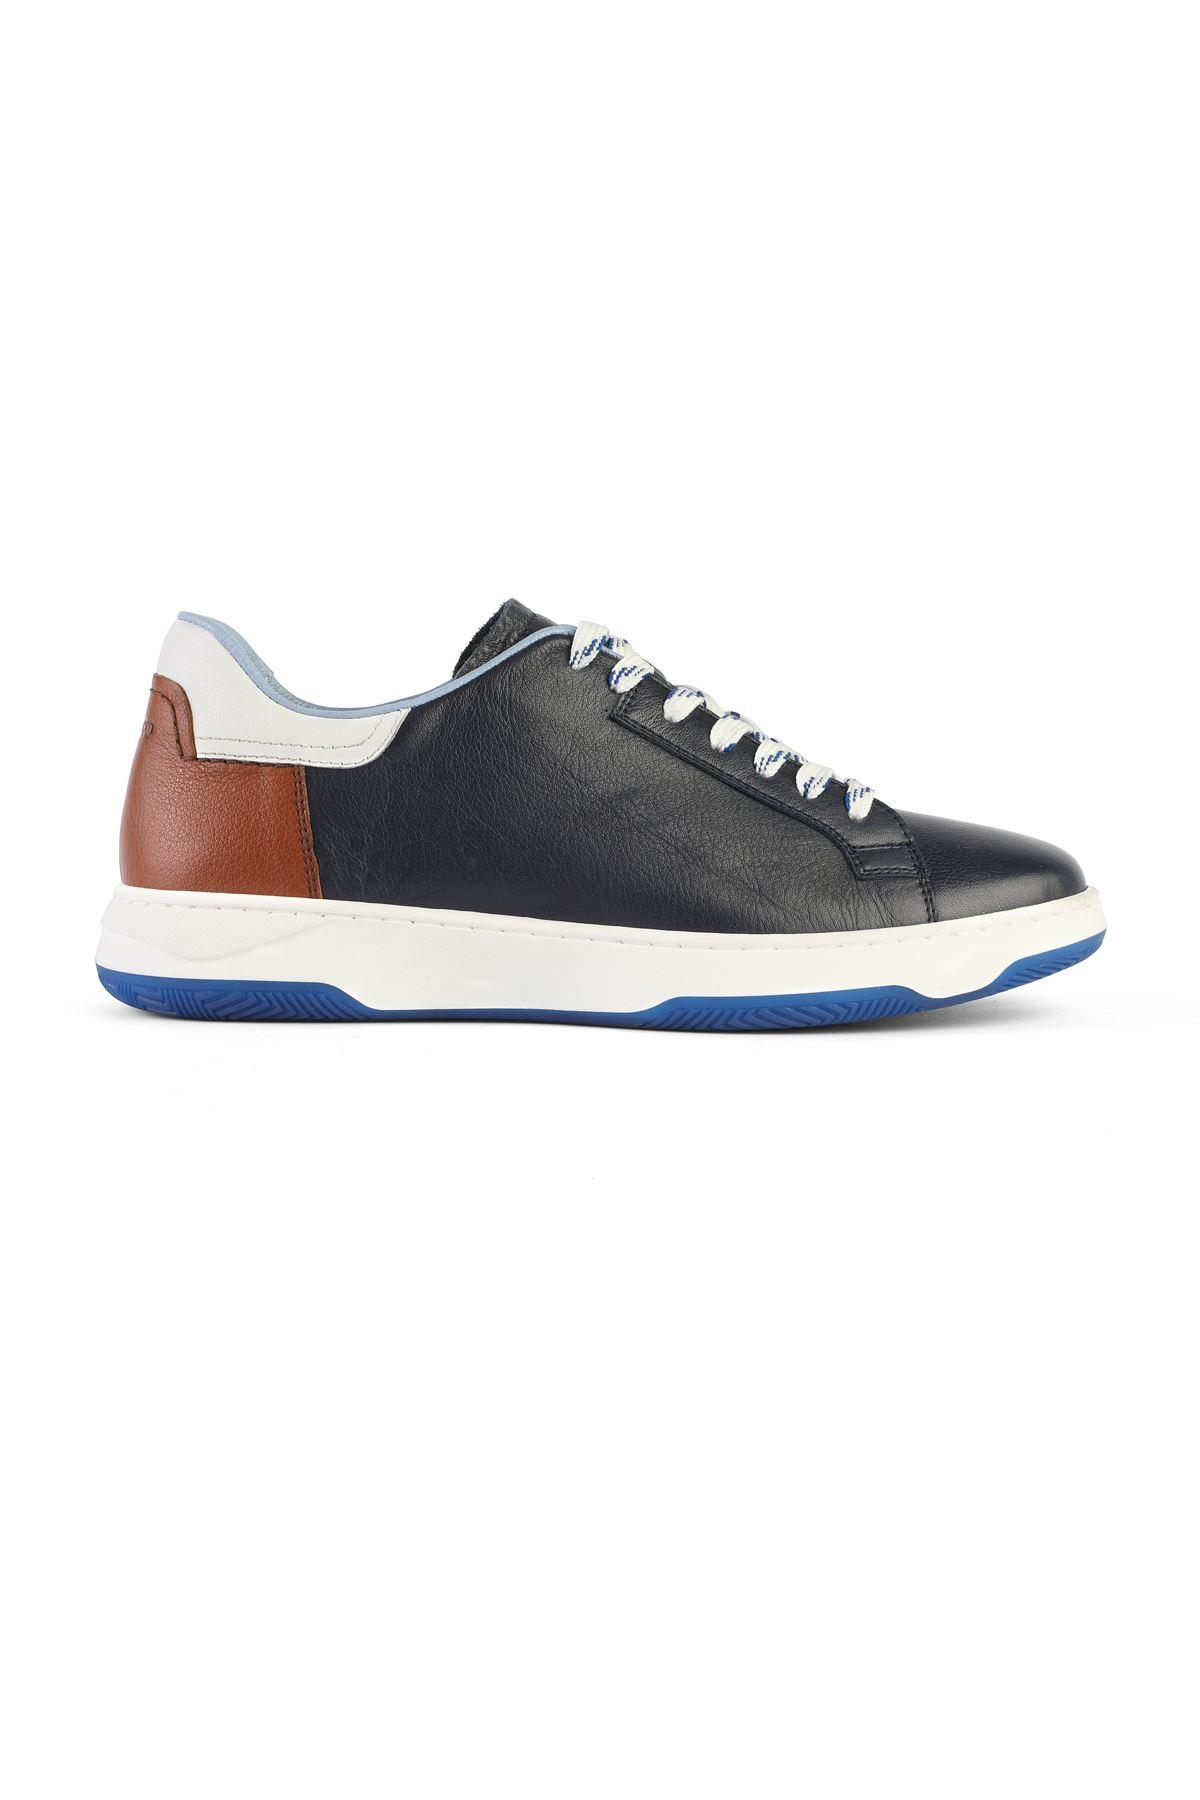 Libero L3227 Navy Blue Sport Shoes